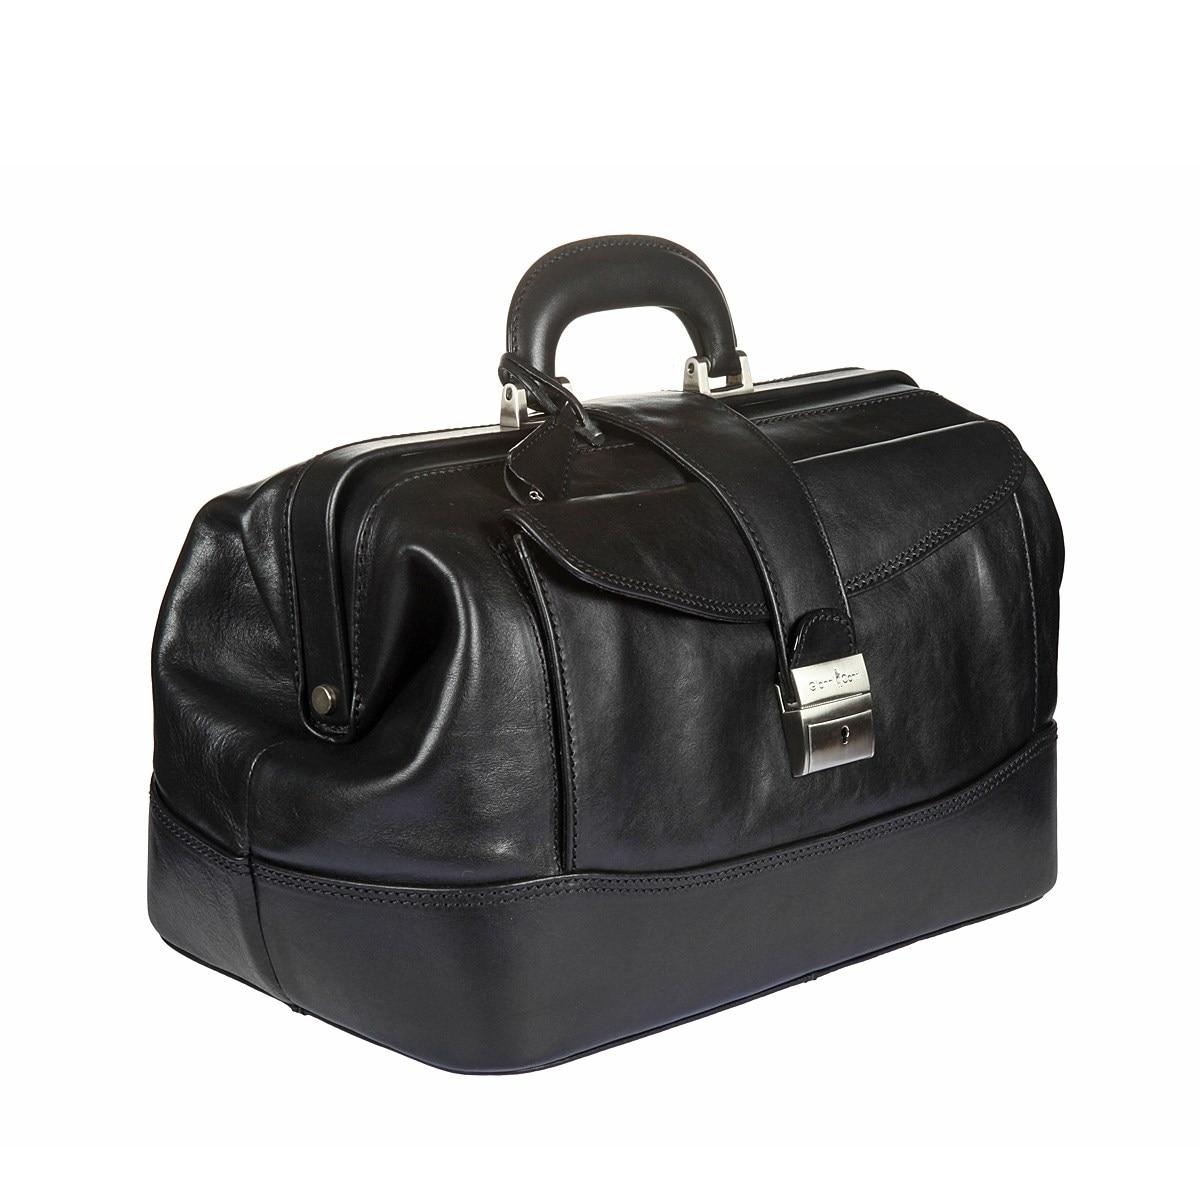 Фото - Traveling Bag Gianni Conti 9401094 black sy16 black professional waterproof outdoor bag backpack dslr slr camera bag case for nikon canon sony pentax fuji